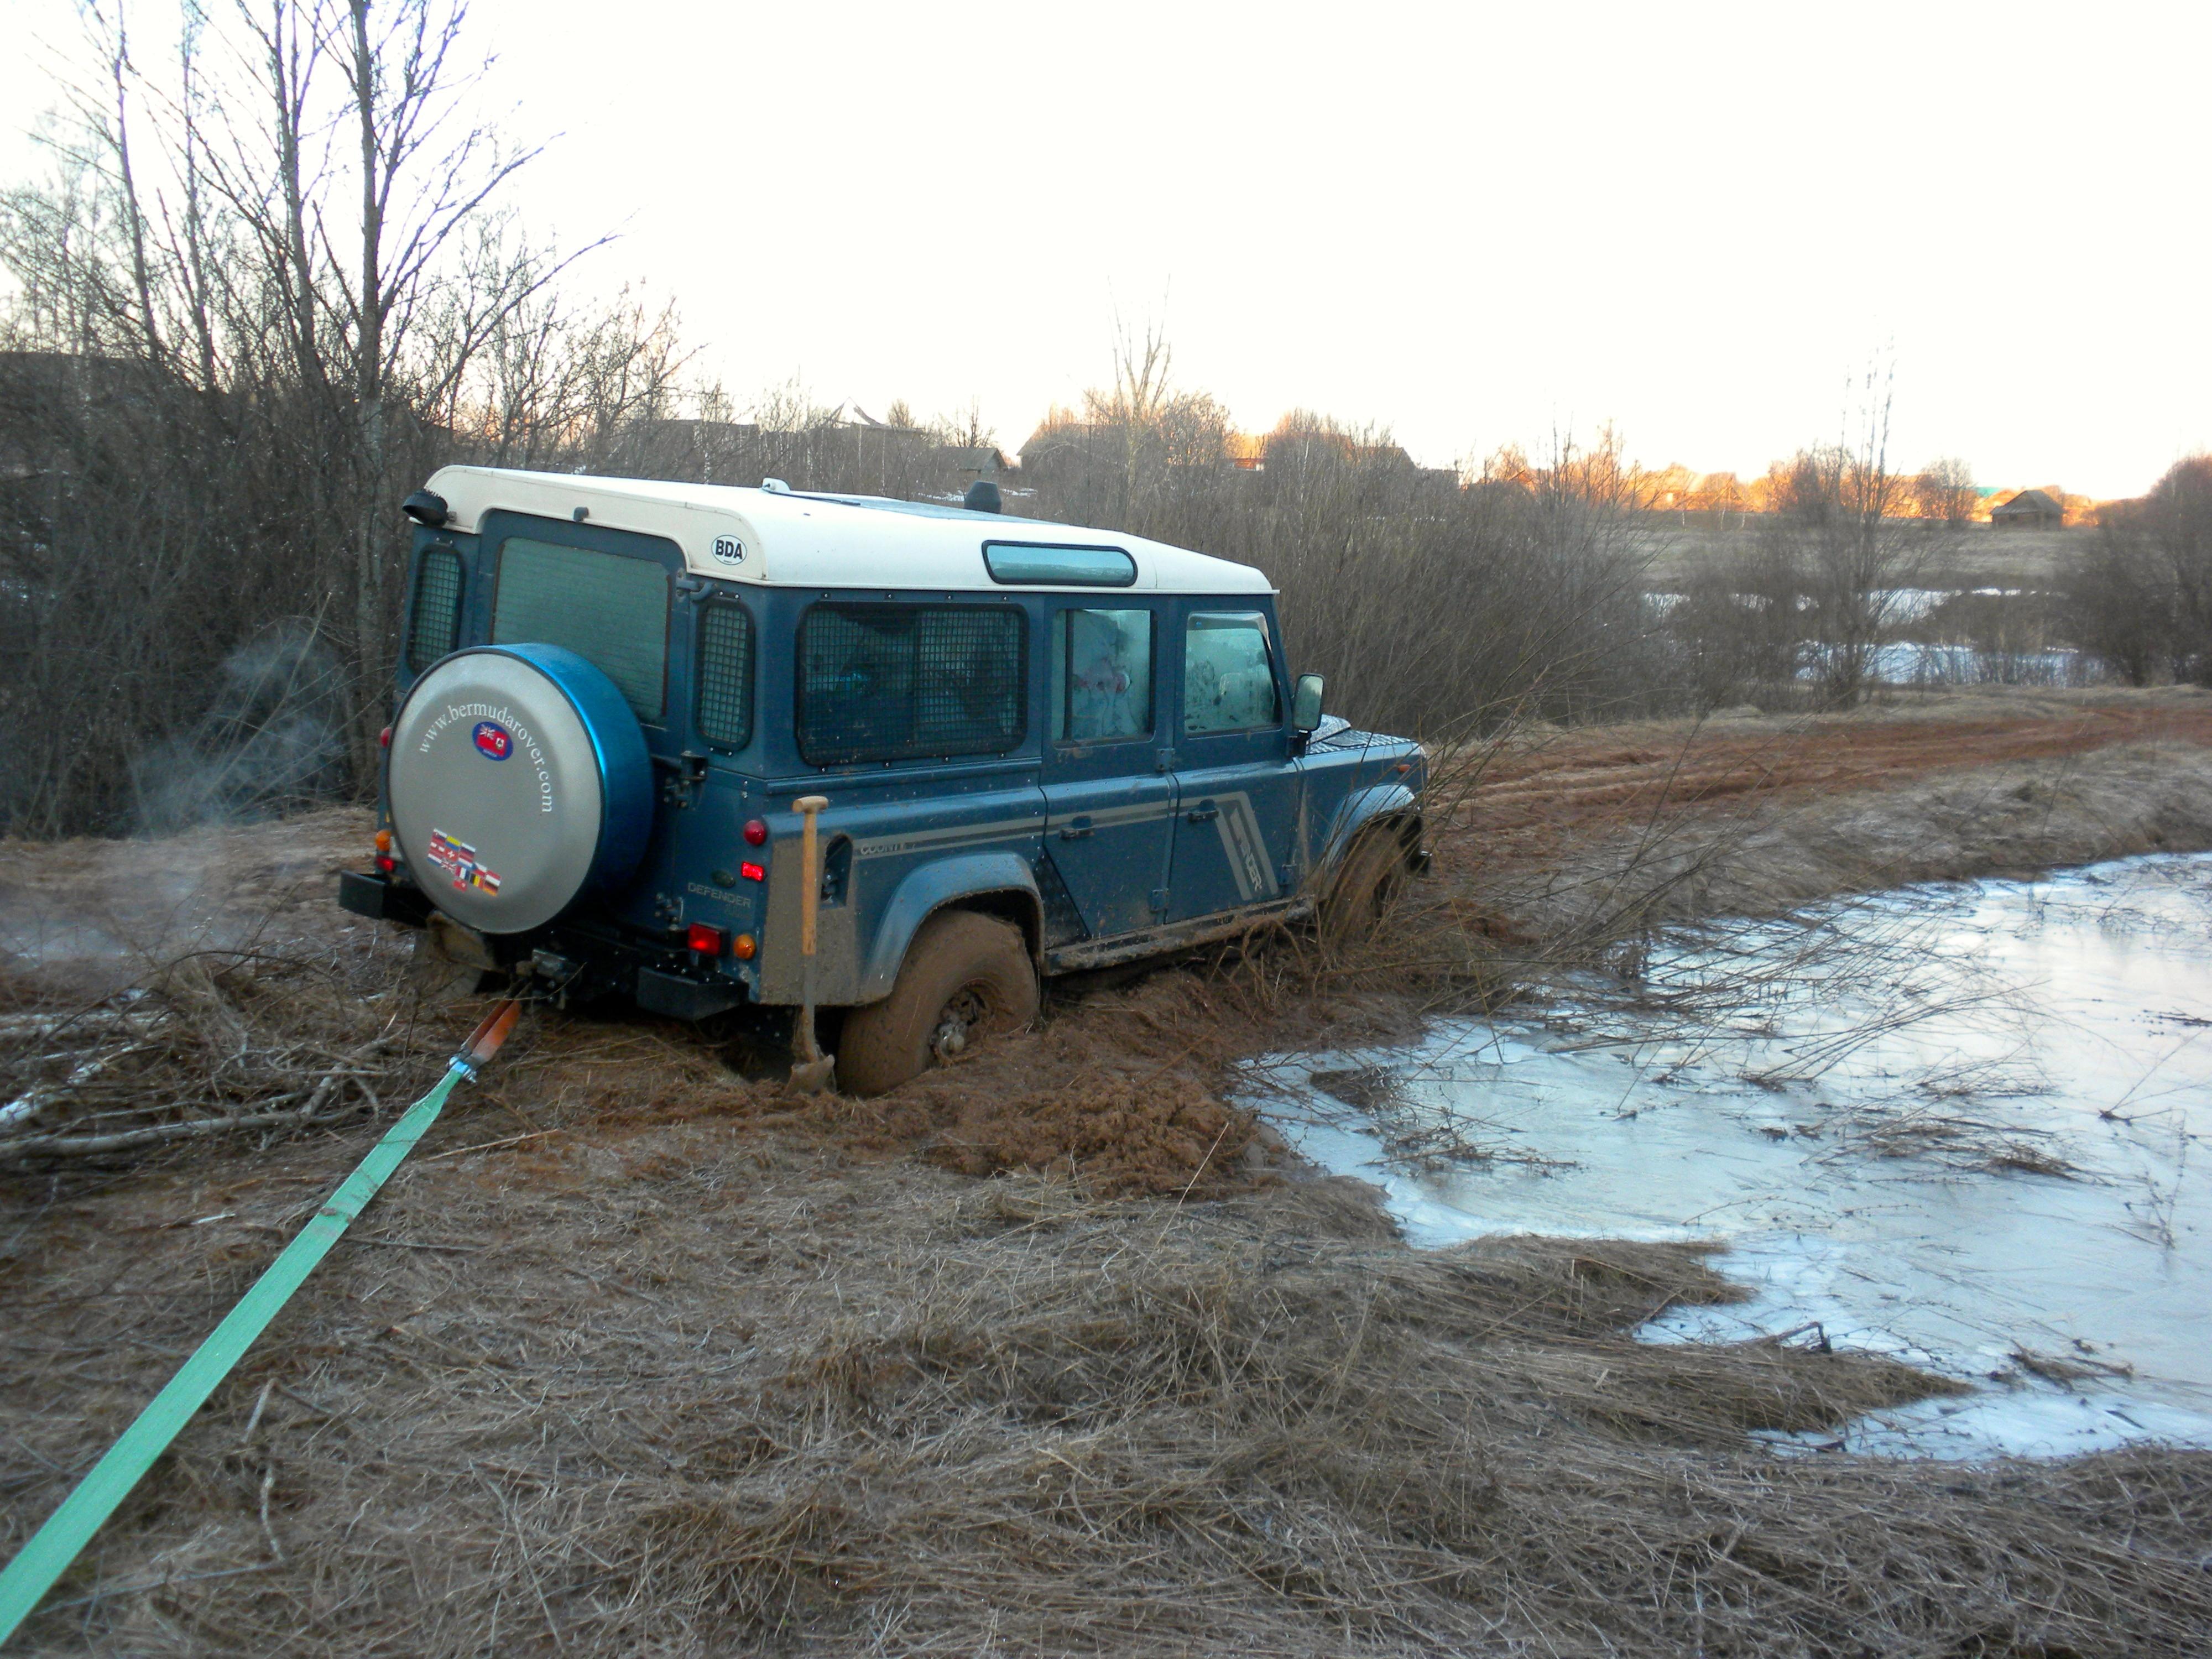 Dscn Driving On Frozen Pond